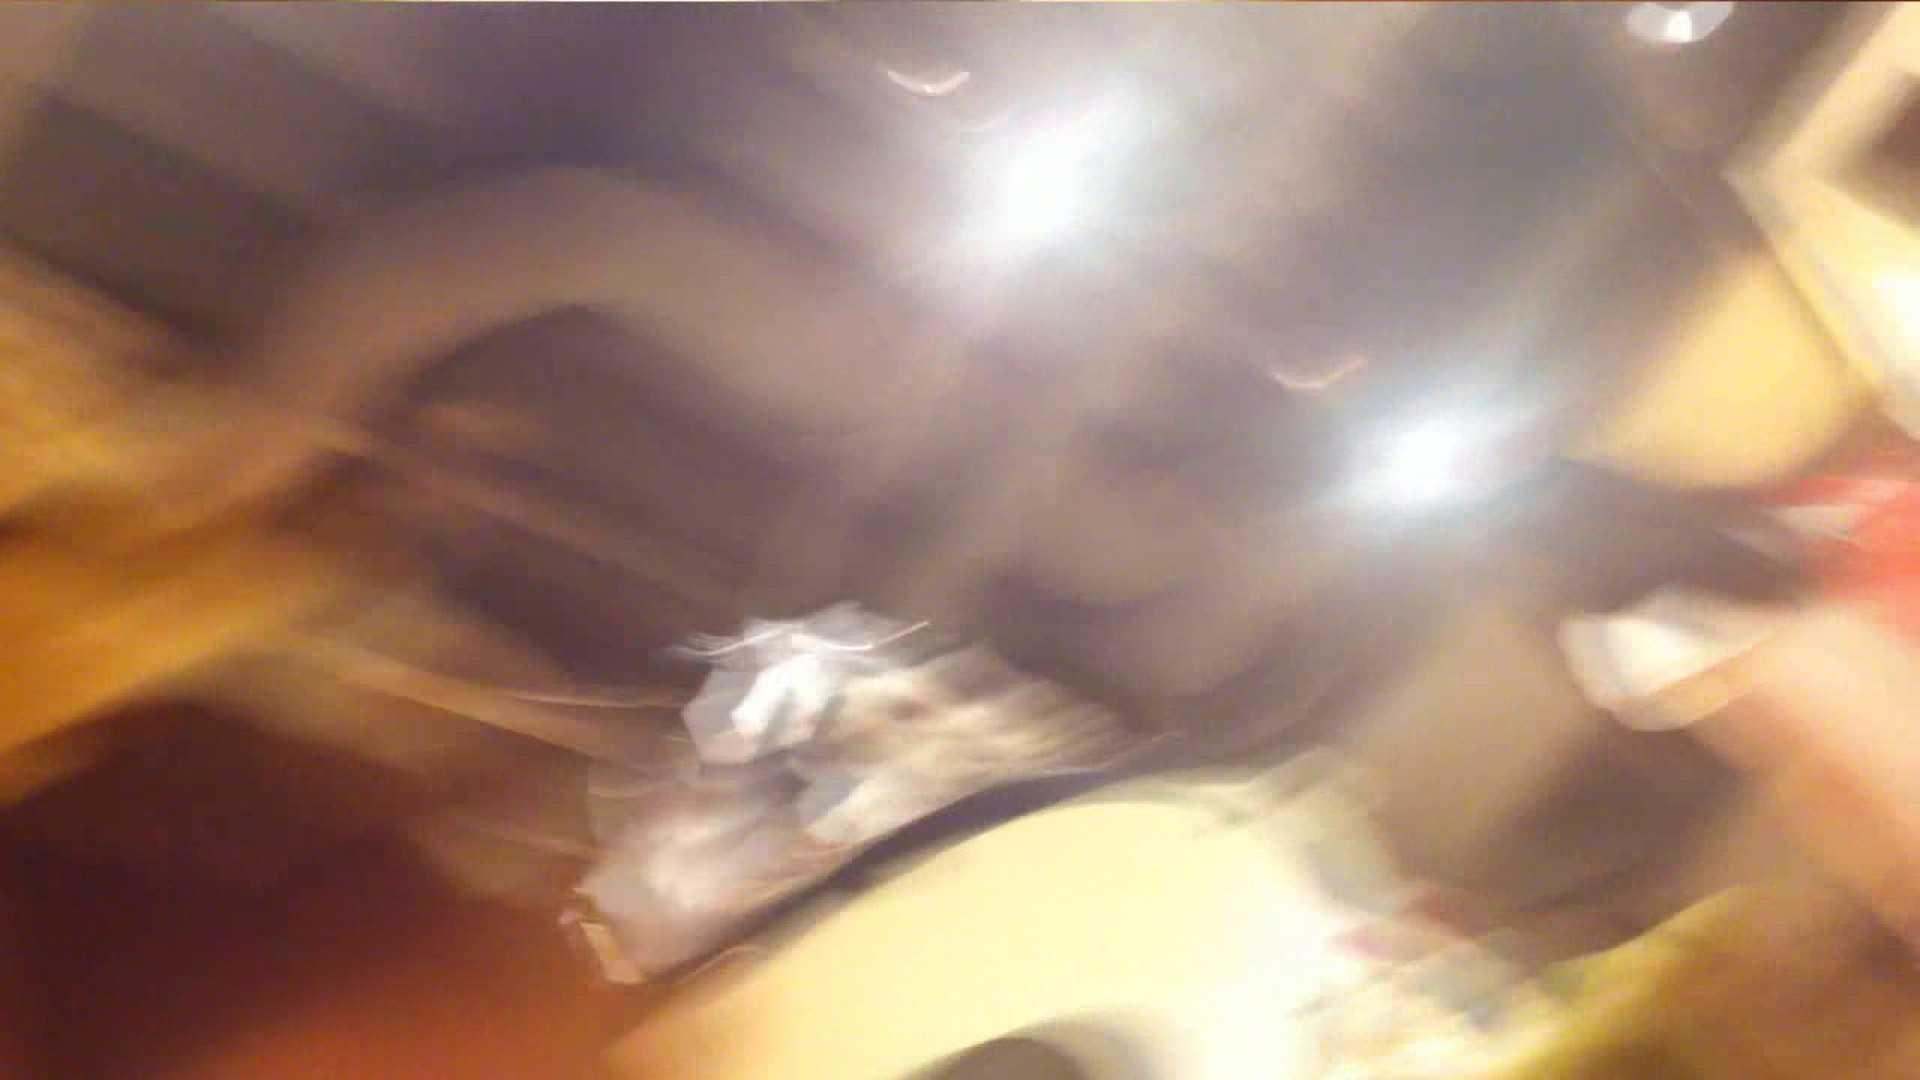 vol.34 美人アパレル胸チラ&パンチラ メガネ属性っていいよね♥ 新入生パンチラ ヌード画像 104pic 88